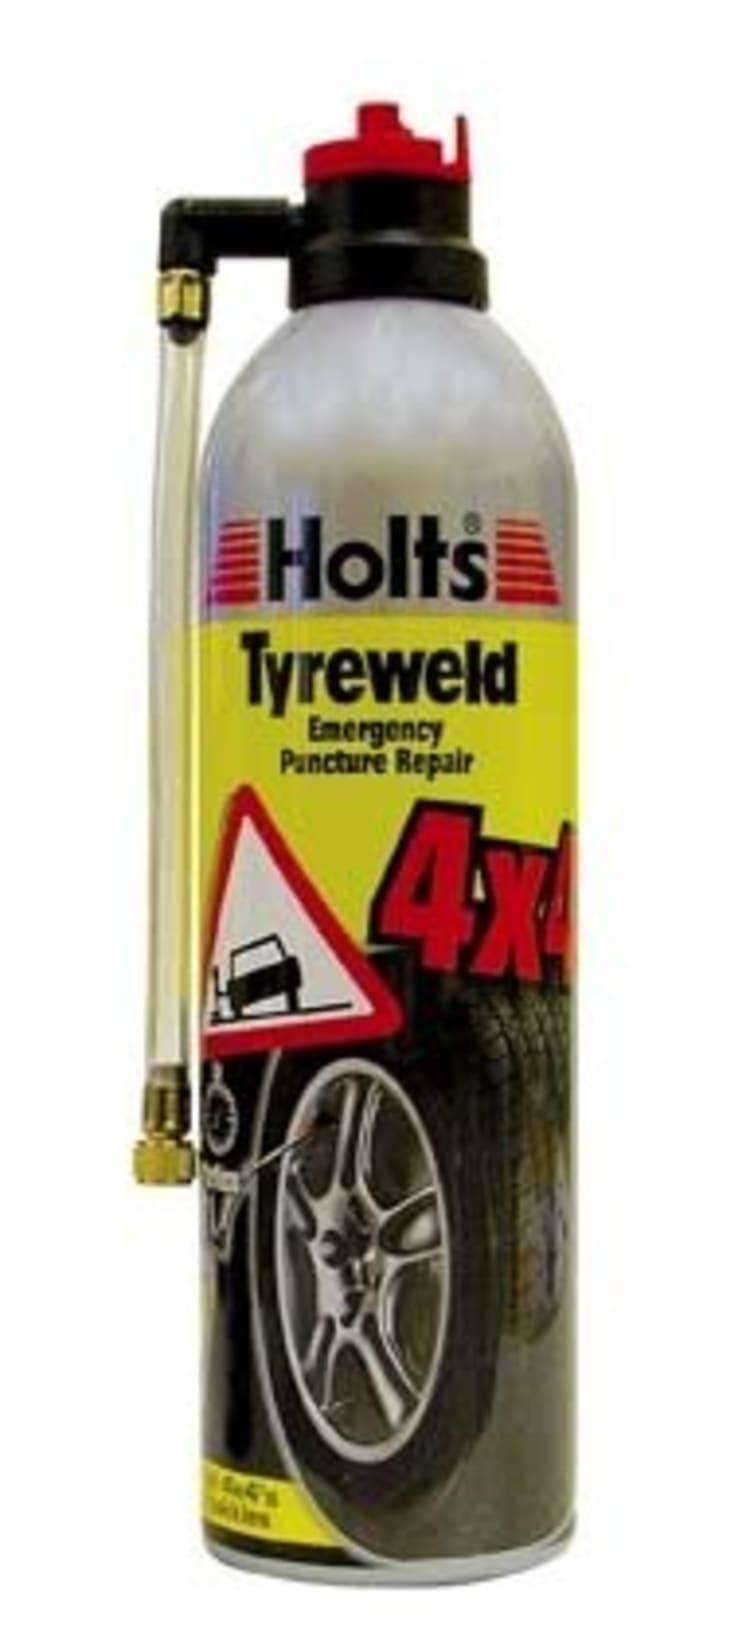 Holts Tyreweld Emergency Puncture Repair 500 ml - default